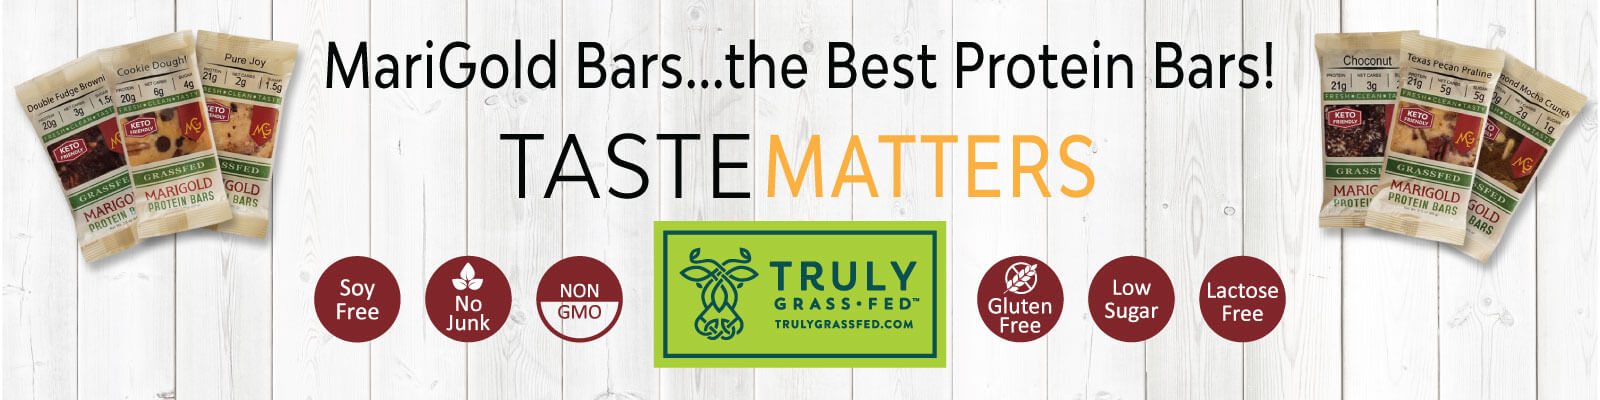 MariGold Bars Protein Bars